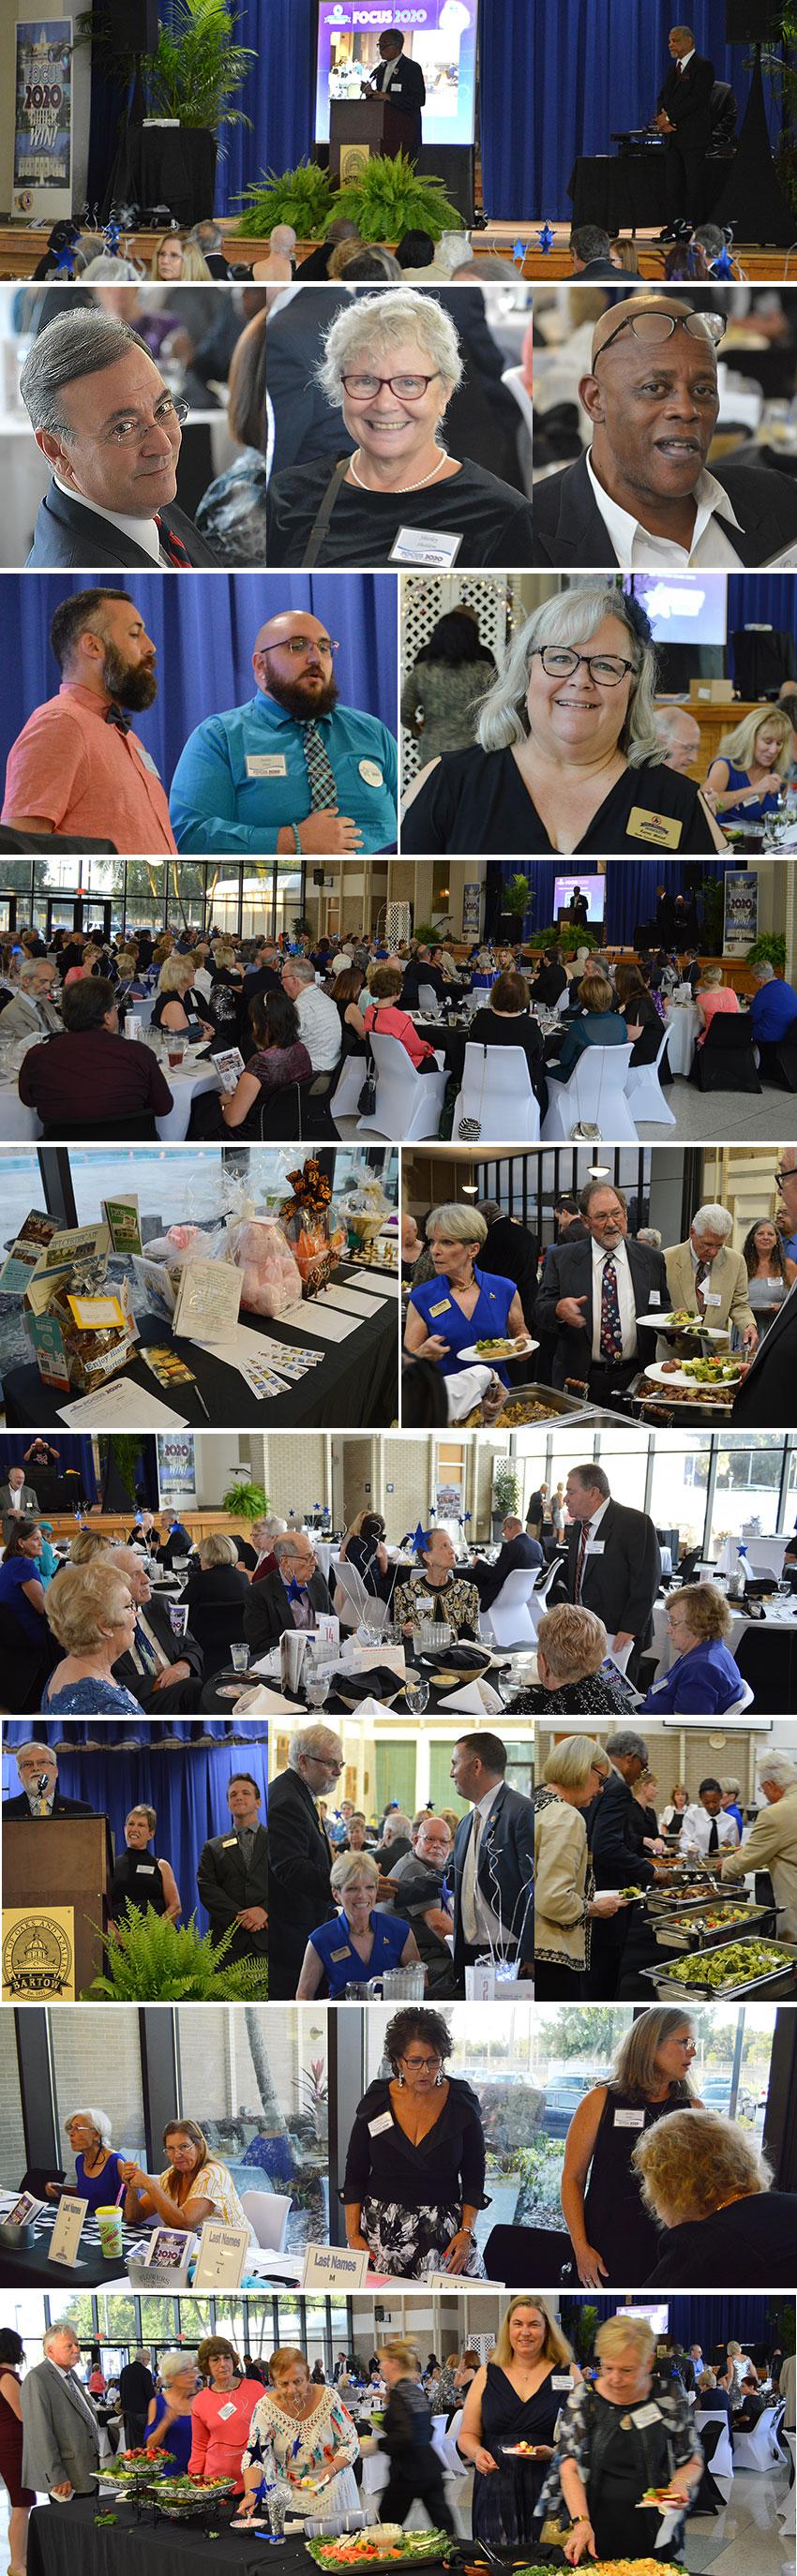 Polk County Democrats 2019 Gala Photos-part 2